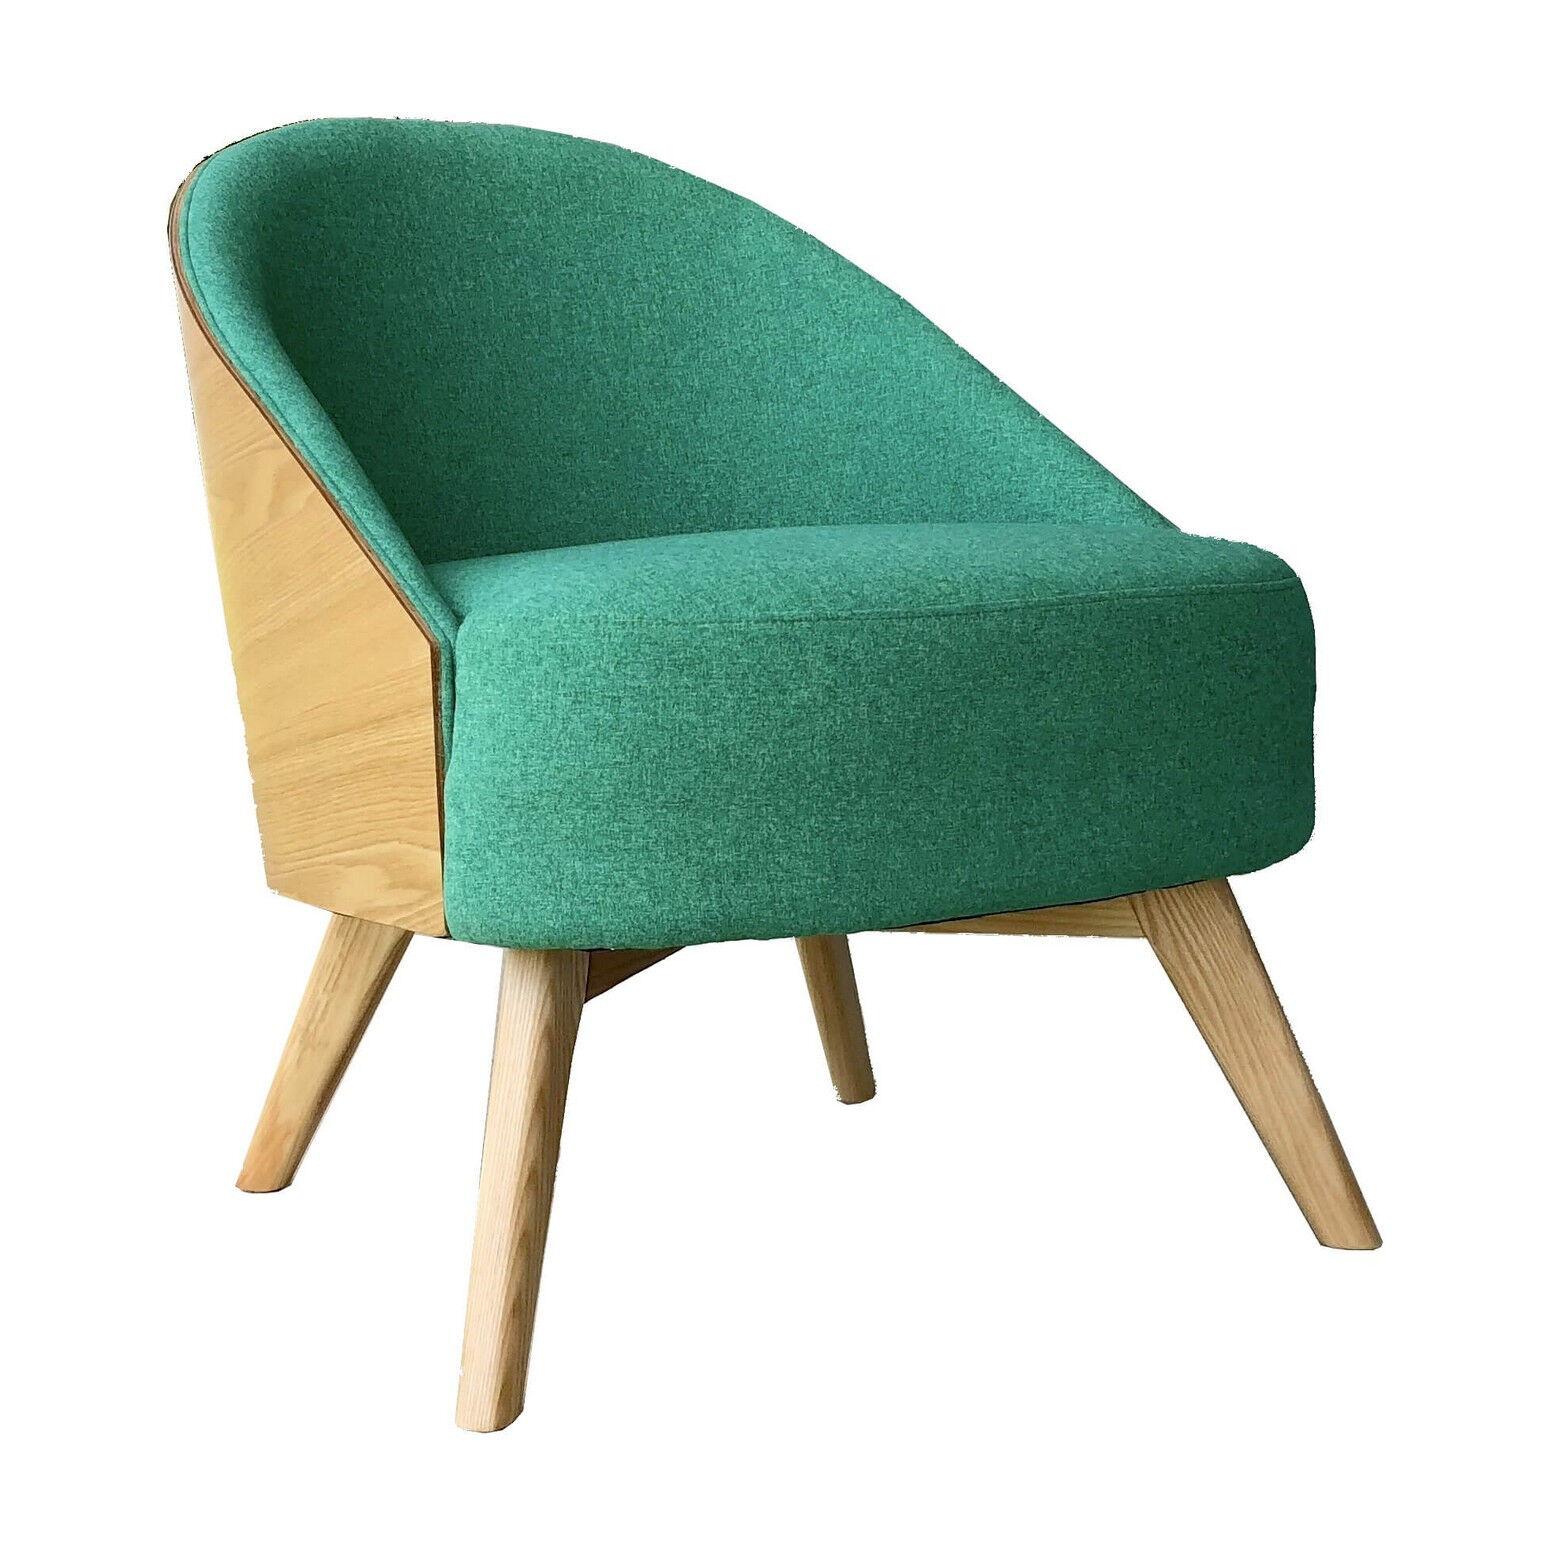 Mathi Design Fauteuil scandinave en tissu vert et bois